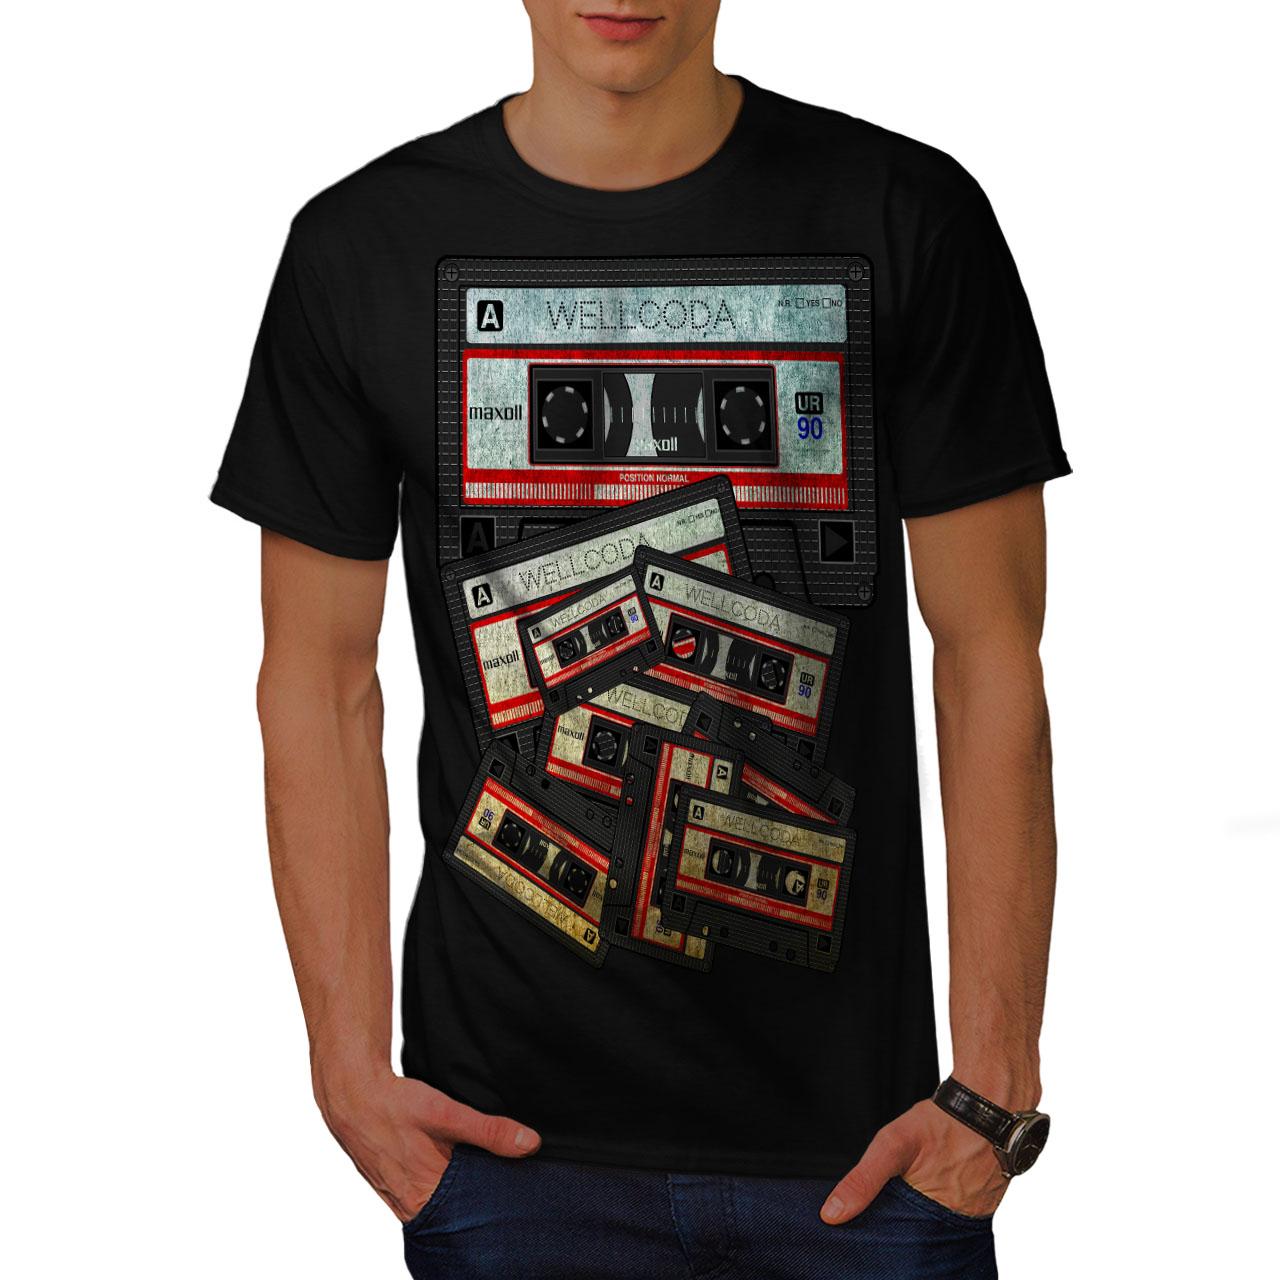 3c02b5fa Wellcoda Music Cassette Tape Mens T-shirt, 90's Graphic Design ...